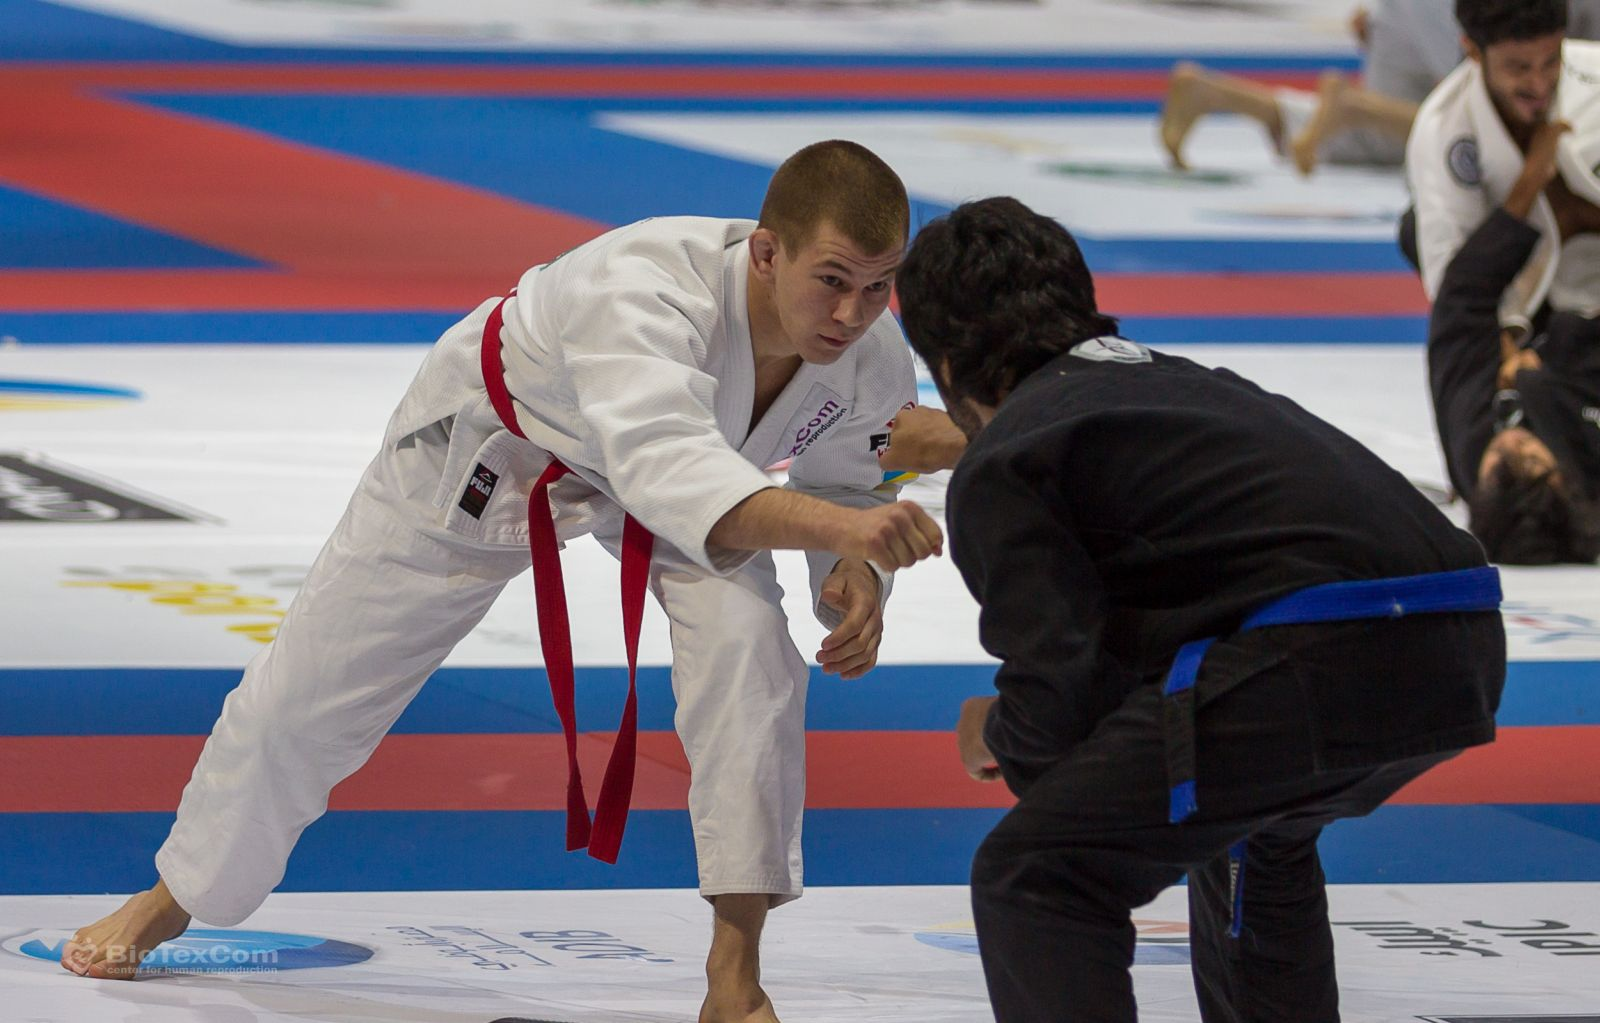 blazhko-yaroslav_Abu-Dhabi-World-Championship-2017-2_02